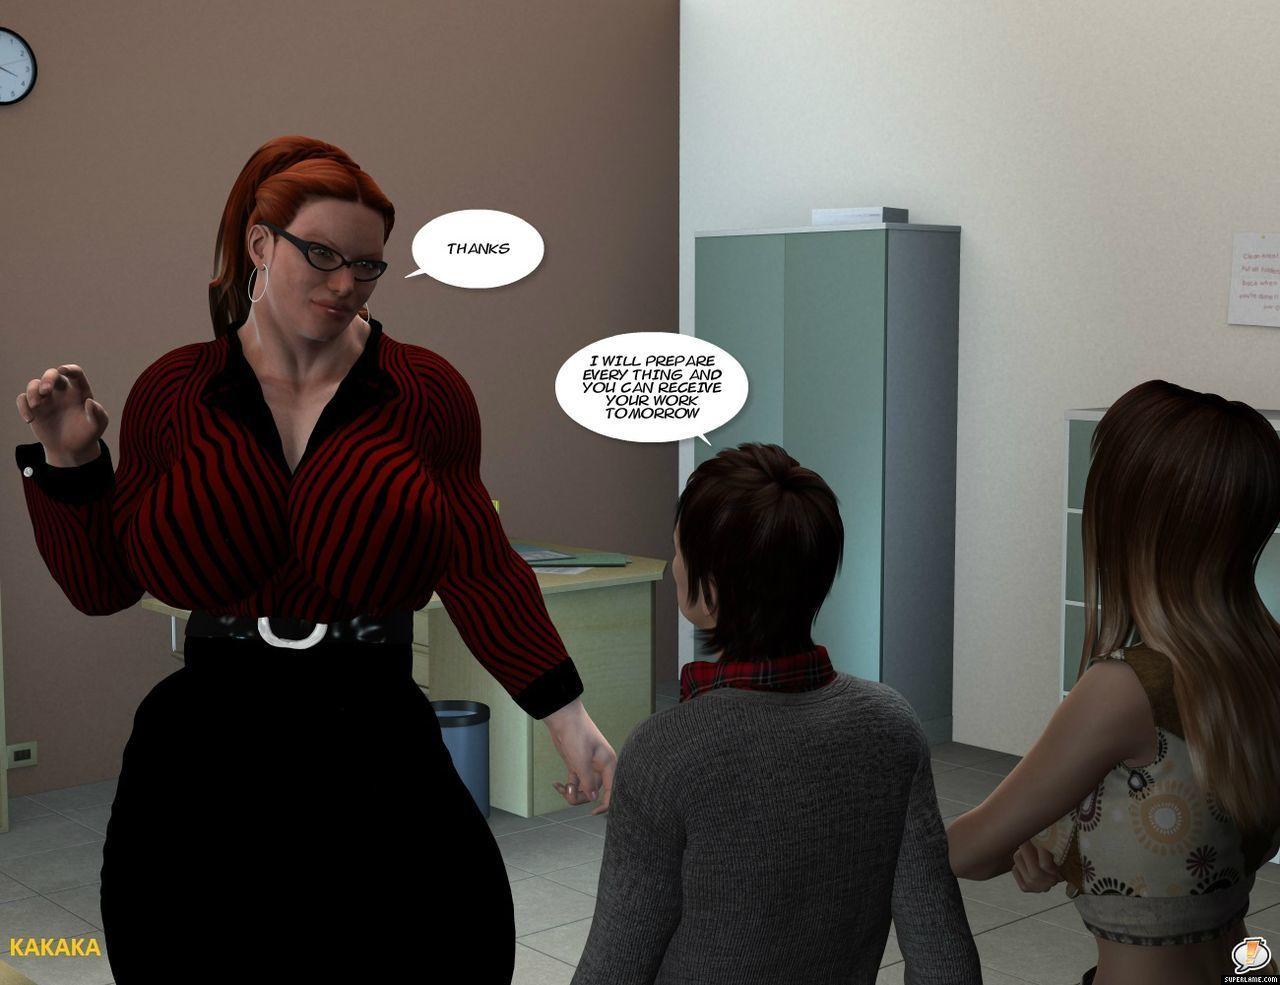 [kakaka] The story of Vera Vincent.